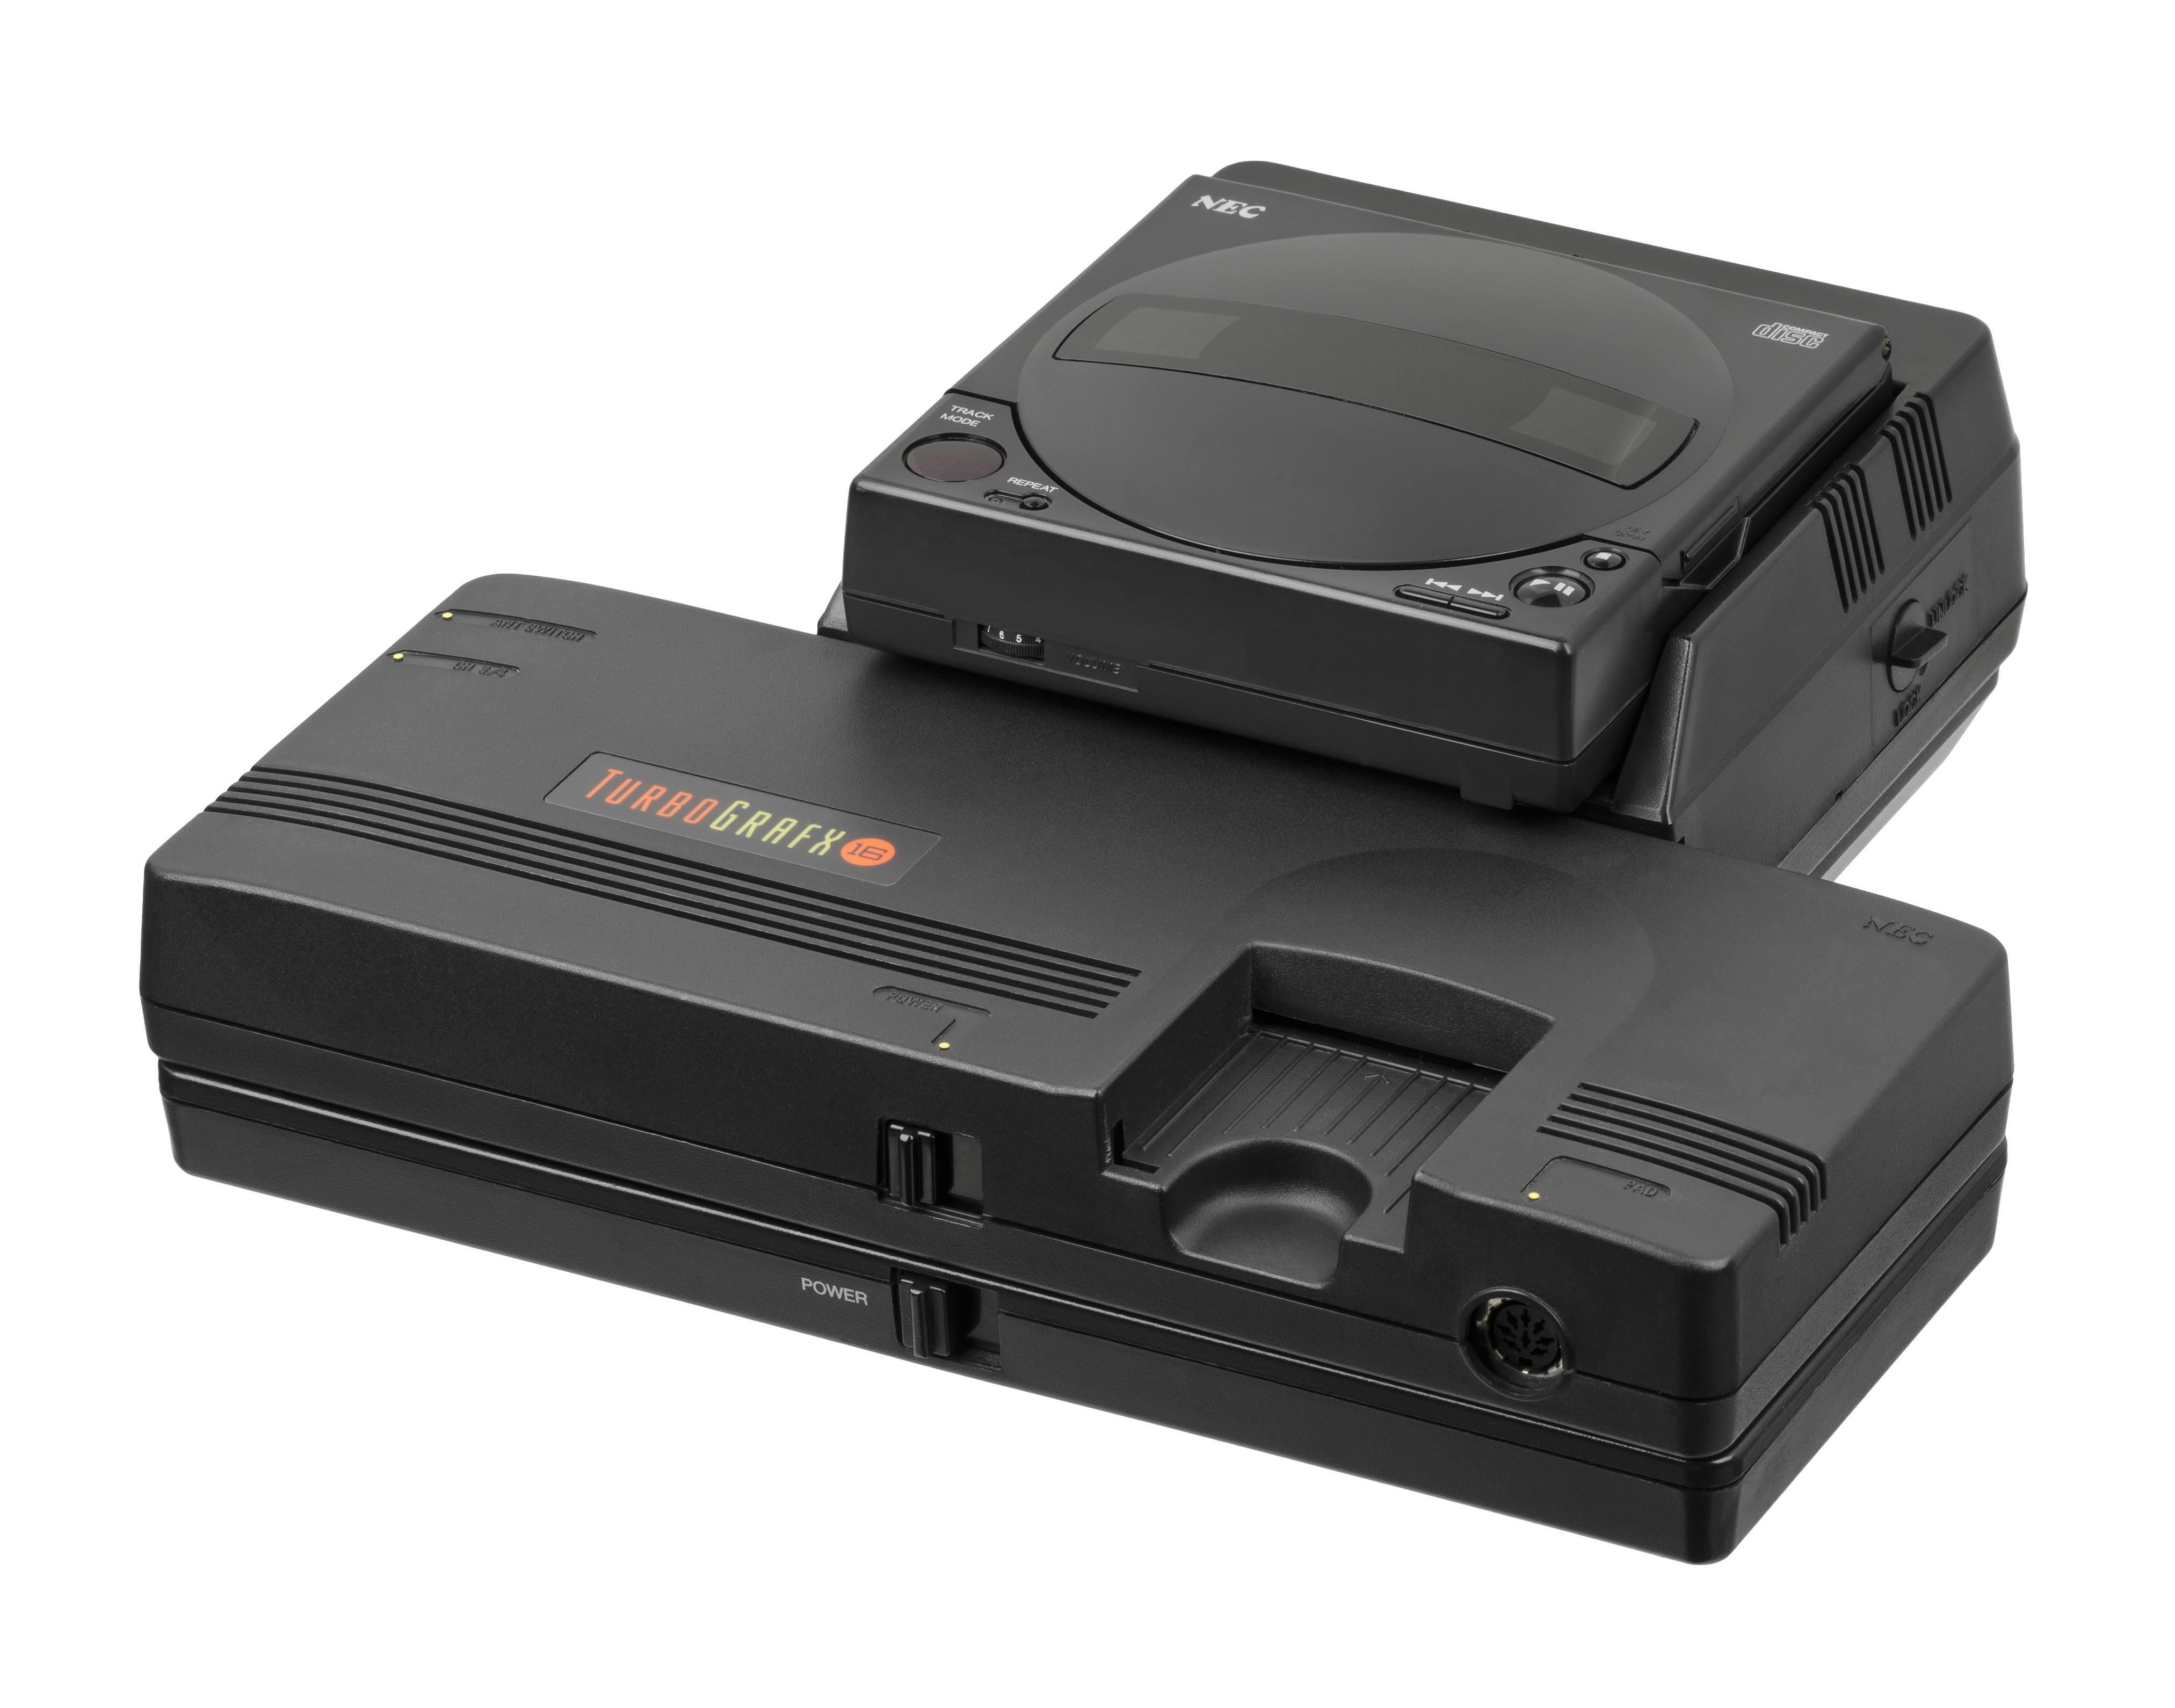 NEC-TurboGrafx-16-CD-FL